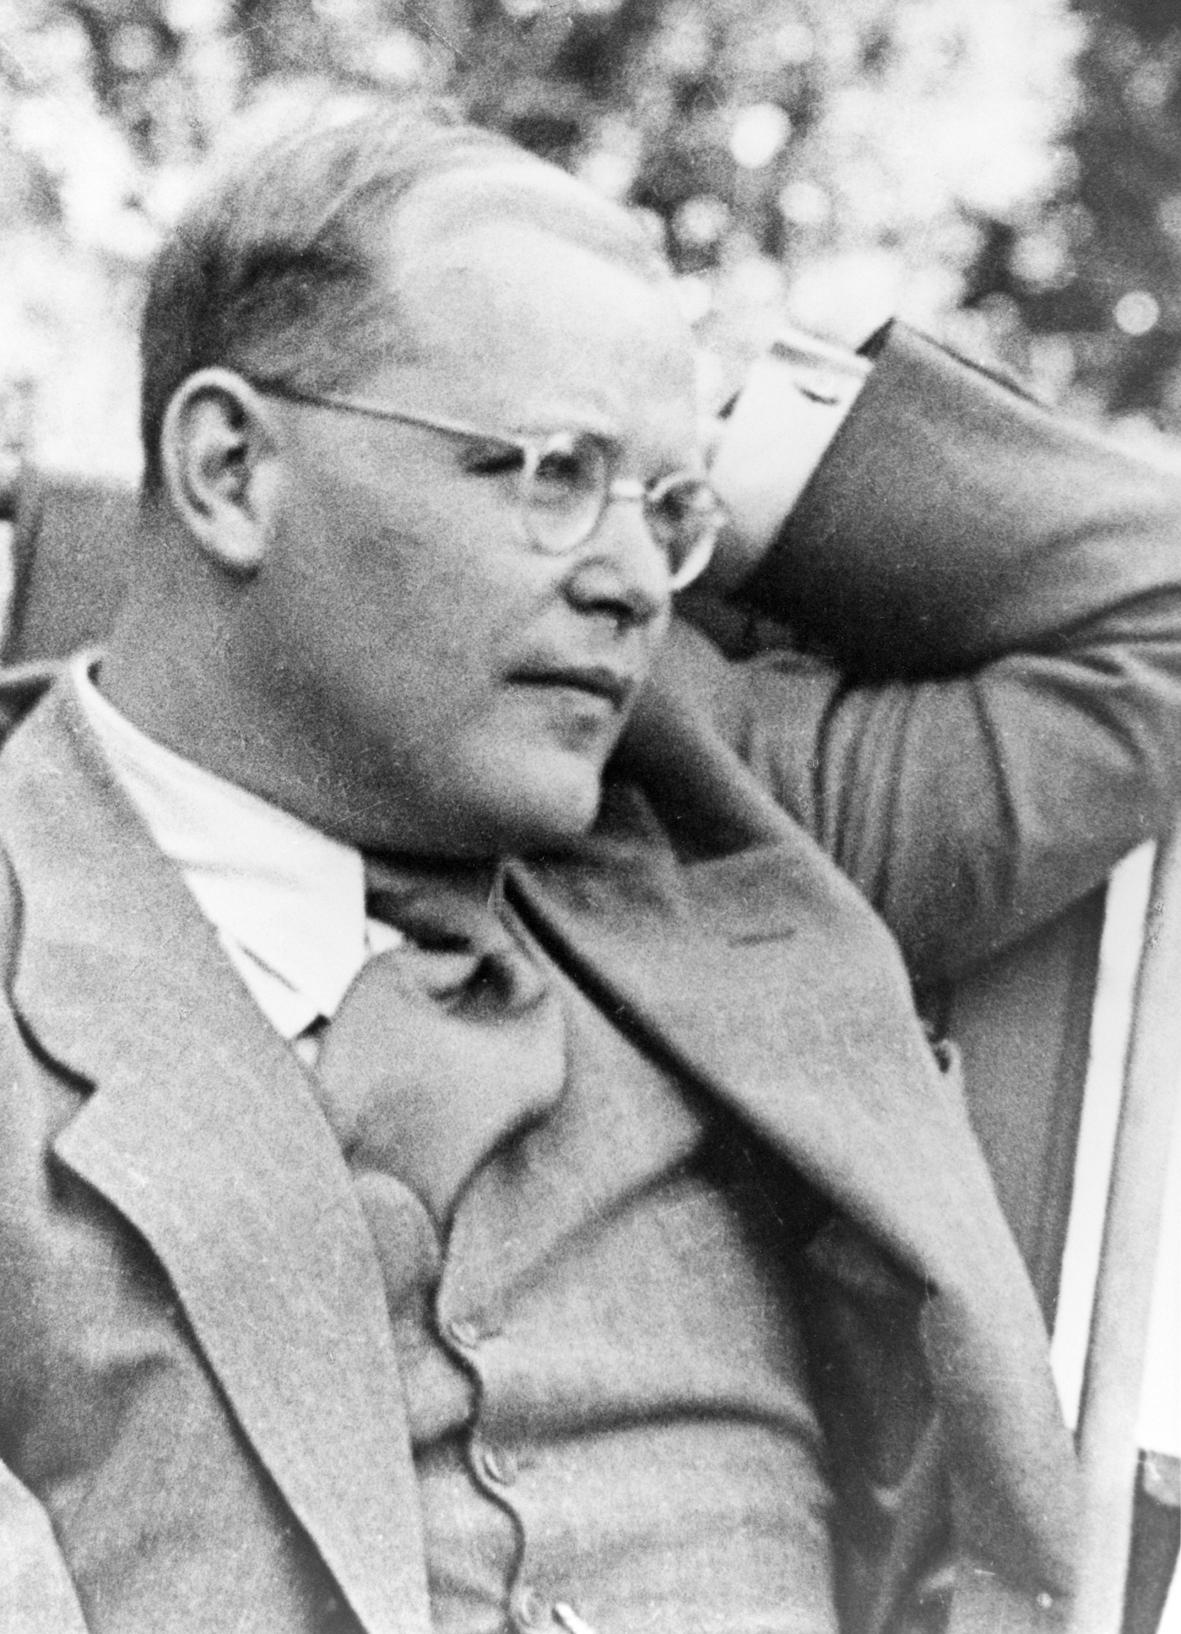 DIETRICH THE THEOLOGIAN - The Dietrich Bonhoeffer Institute